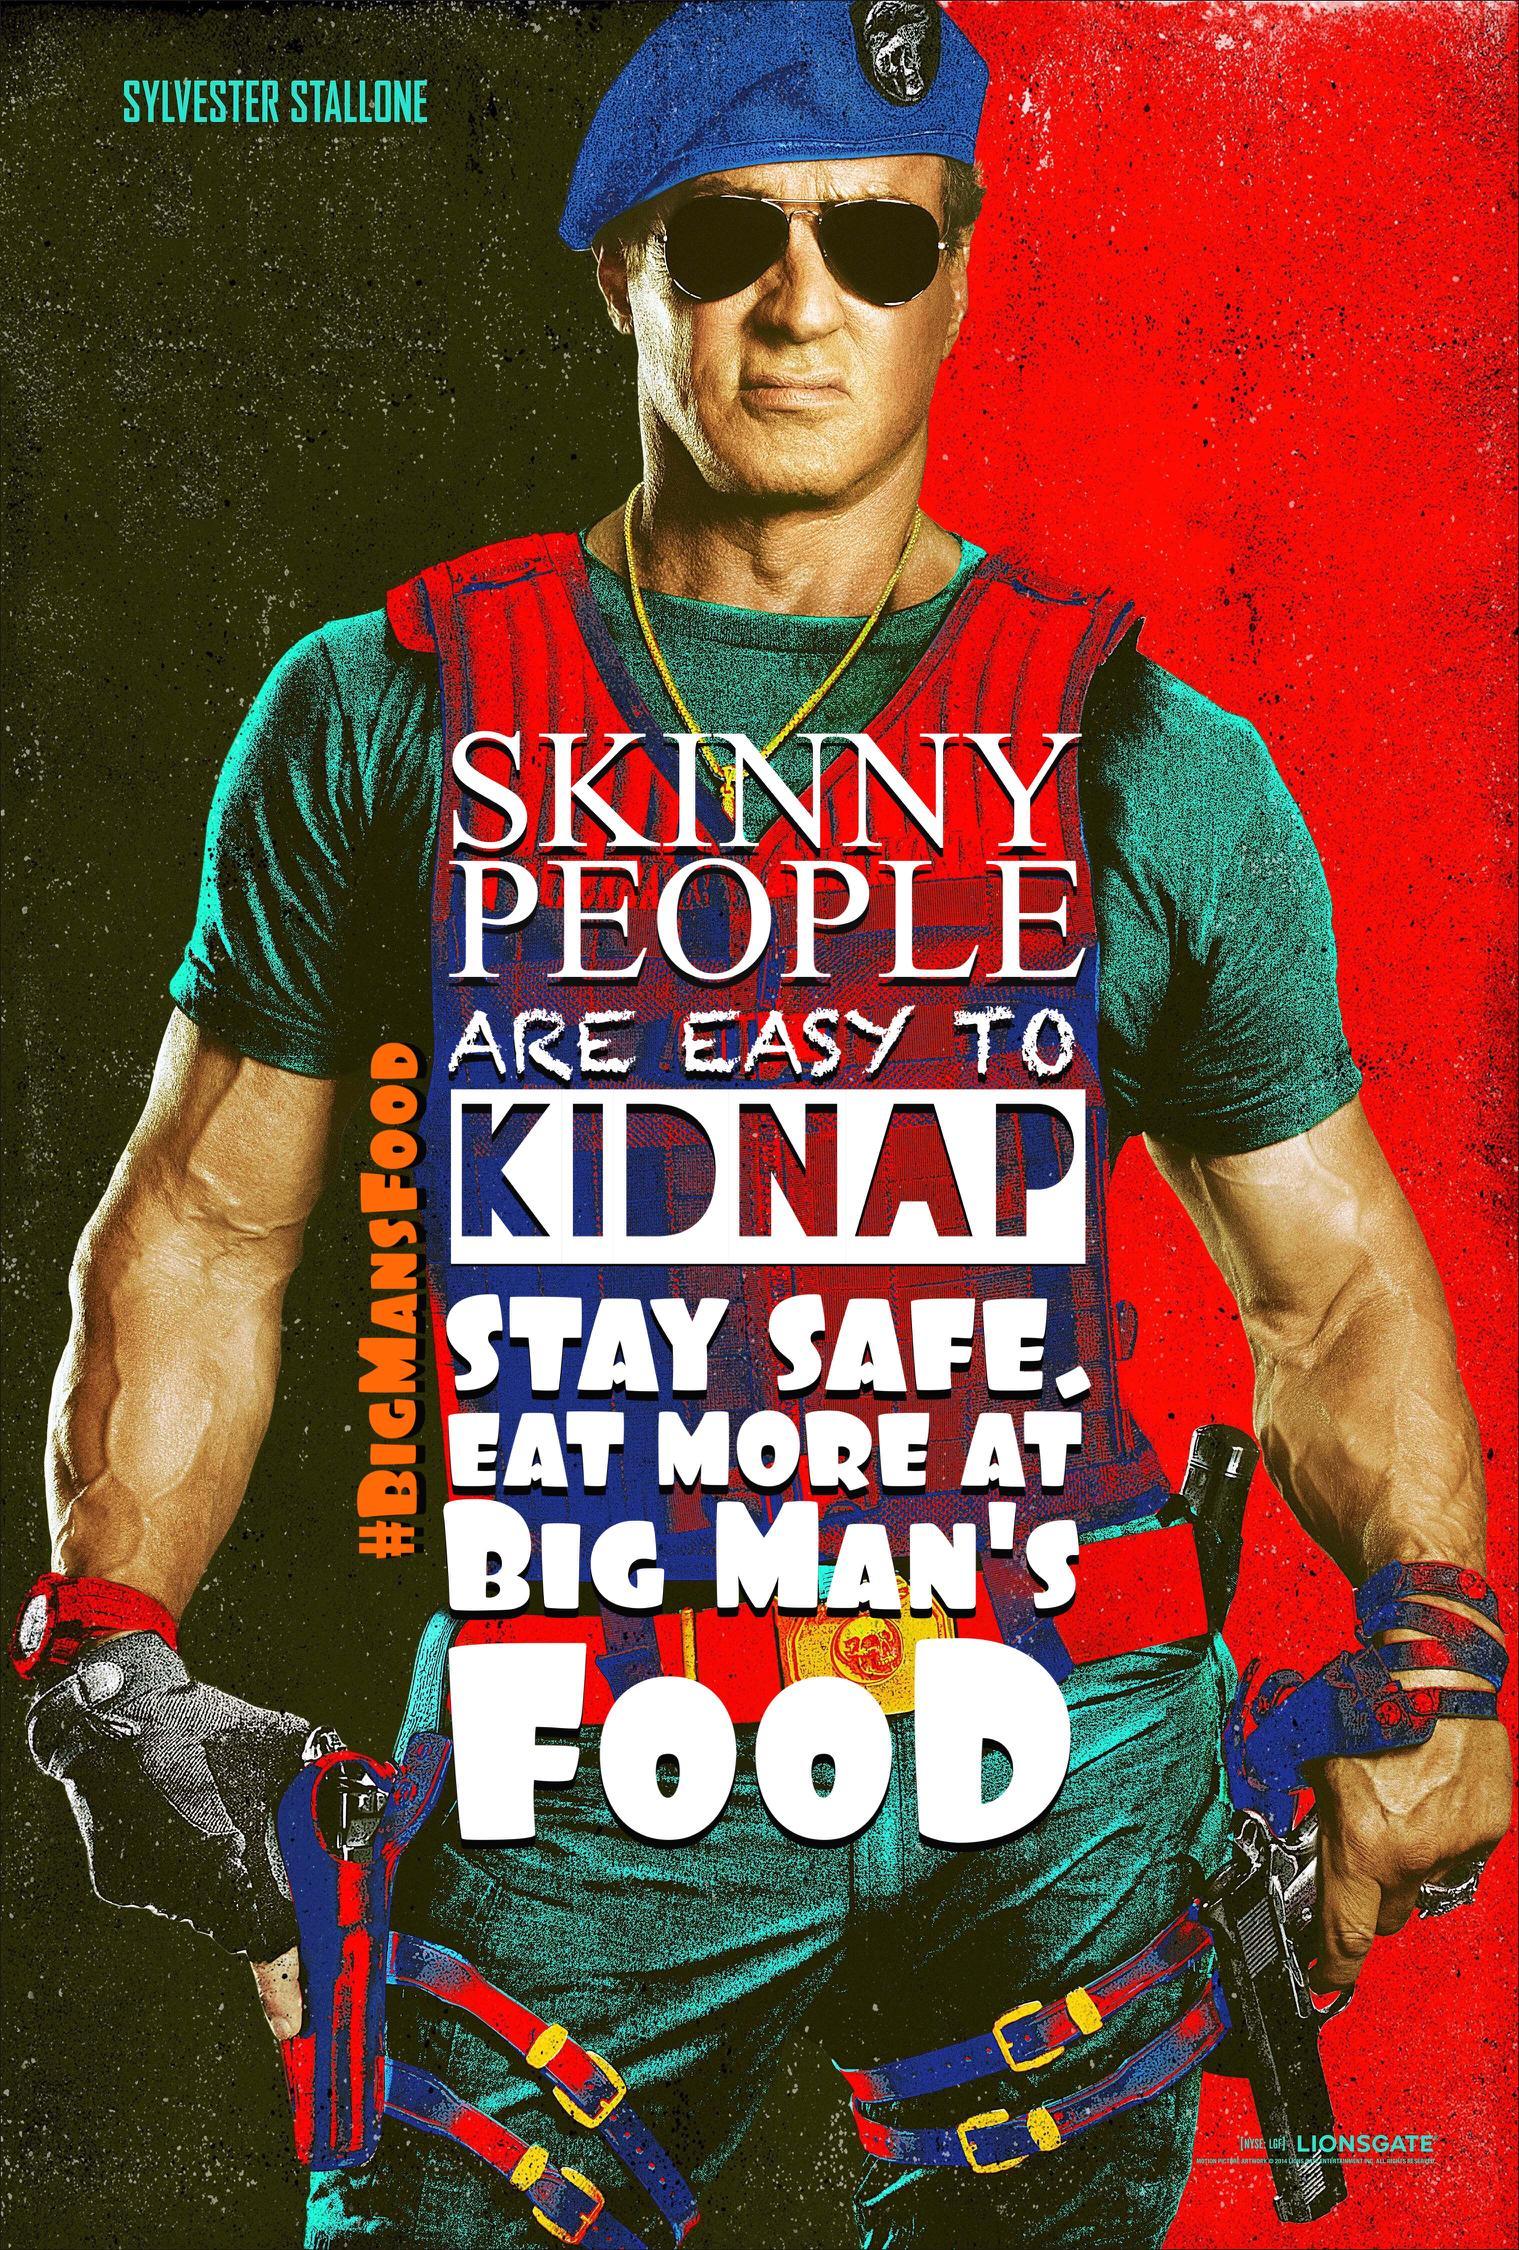 #BigMansFood